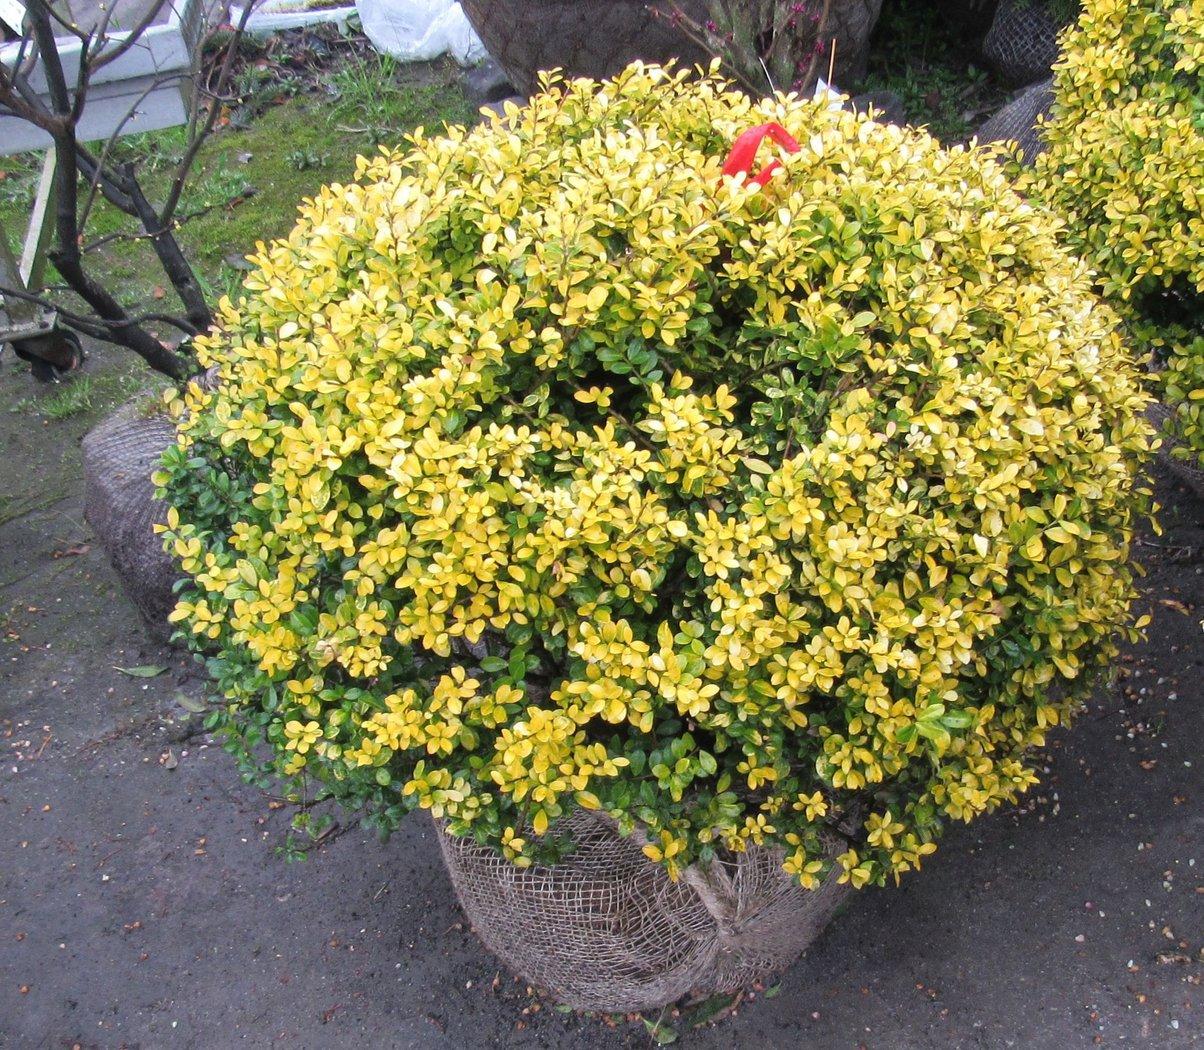 Goldilex, Ilex crenata golden gem als Kugel, Höhe 70-80 cm ...